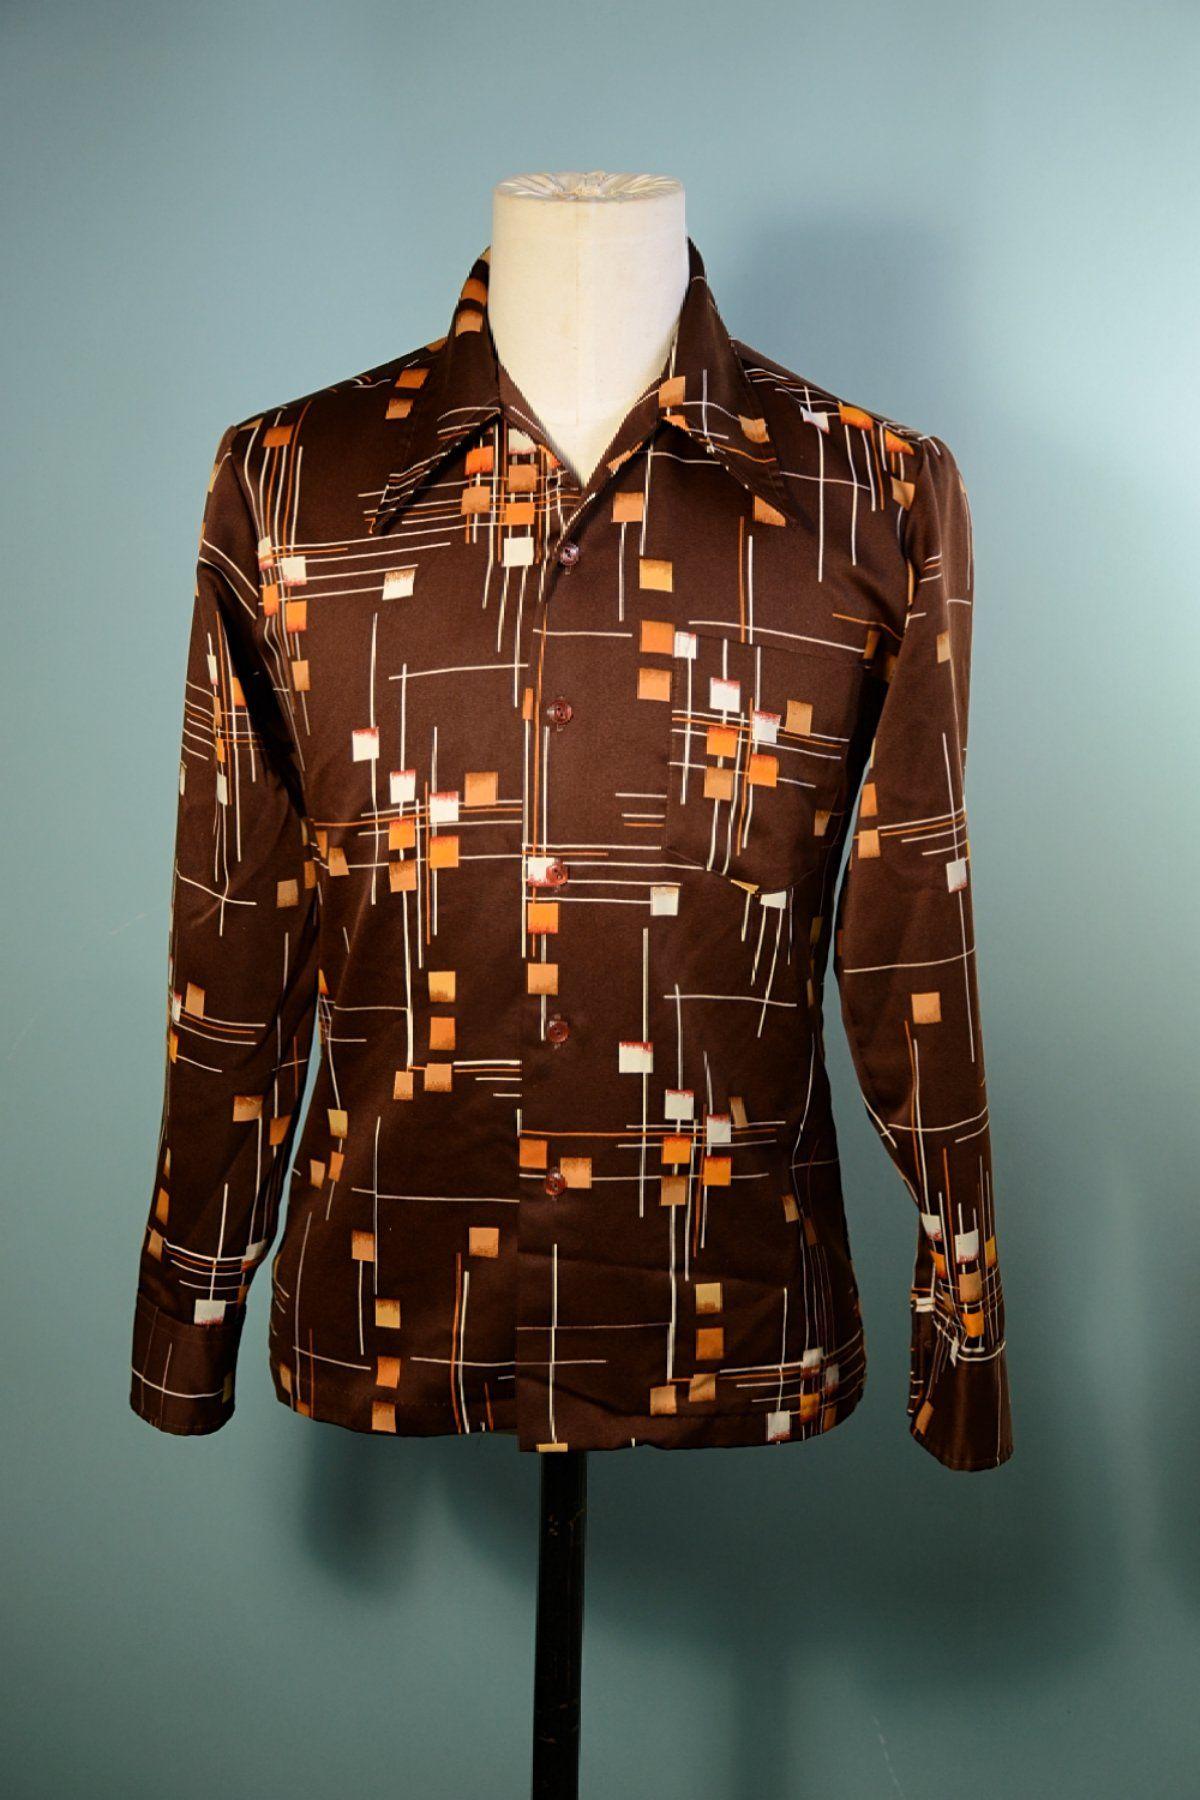 Cream Button Up Shirt with Sharp Collar 70s